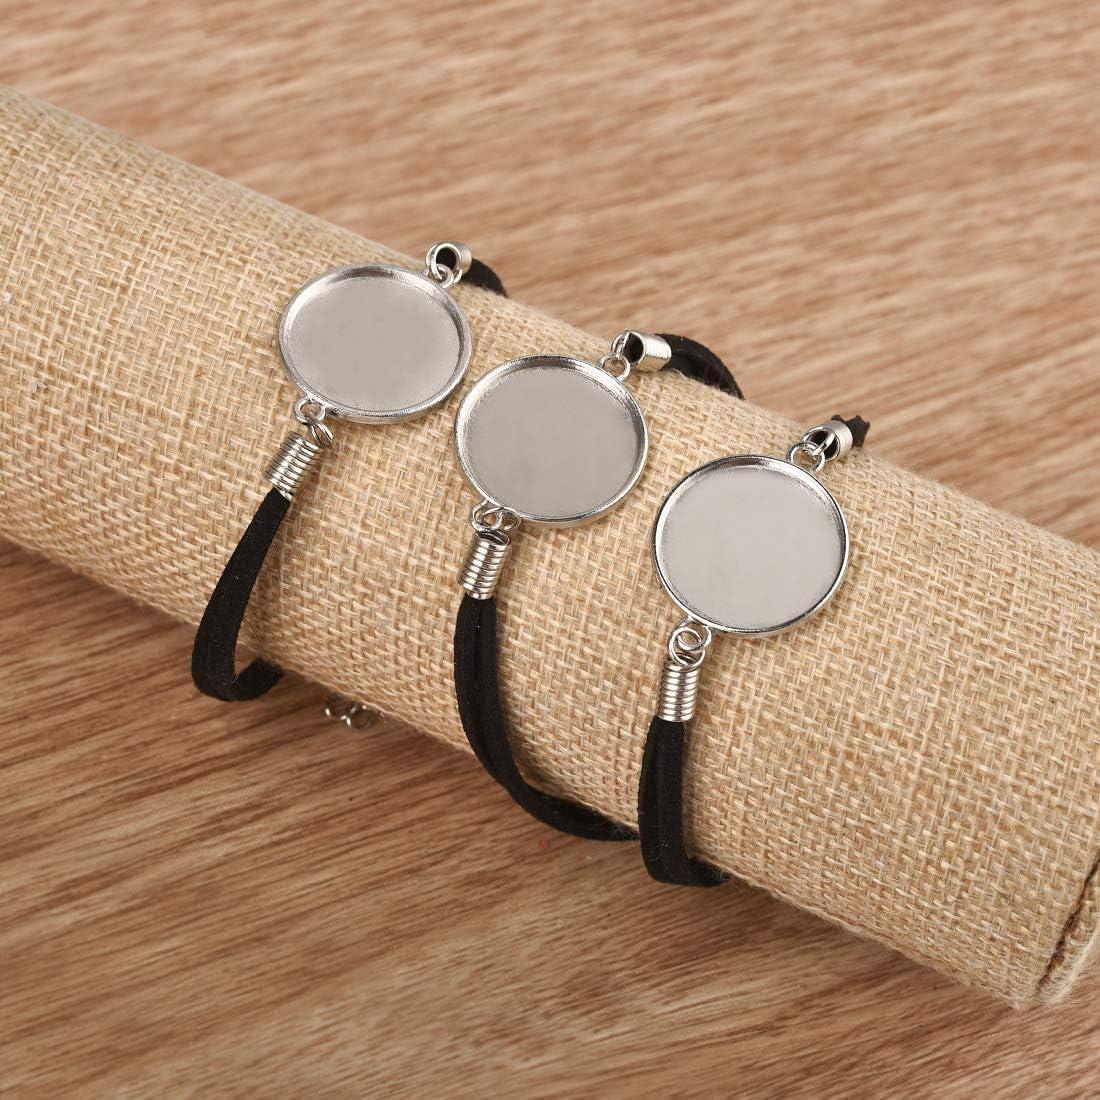 DROLE 40Pcs 25mm Adjustable Leather Cabochon Bracelet Blanks Set-20Pcs Bracelet Bezel for Jewelry Making and 20Pcs 25mm Transparent Glass Dome Cabochon for Bracelet Making Multi-25mm C